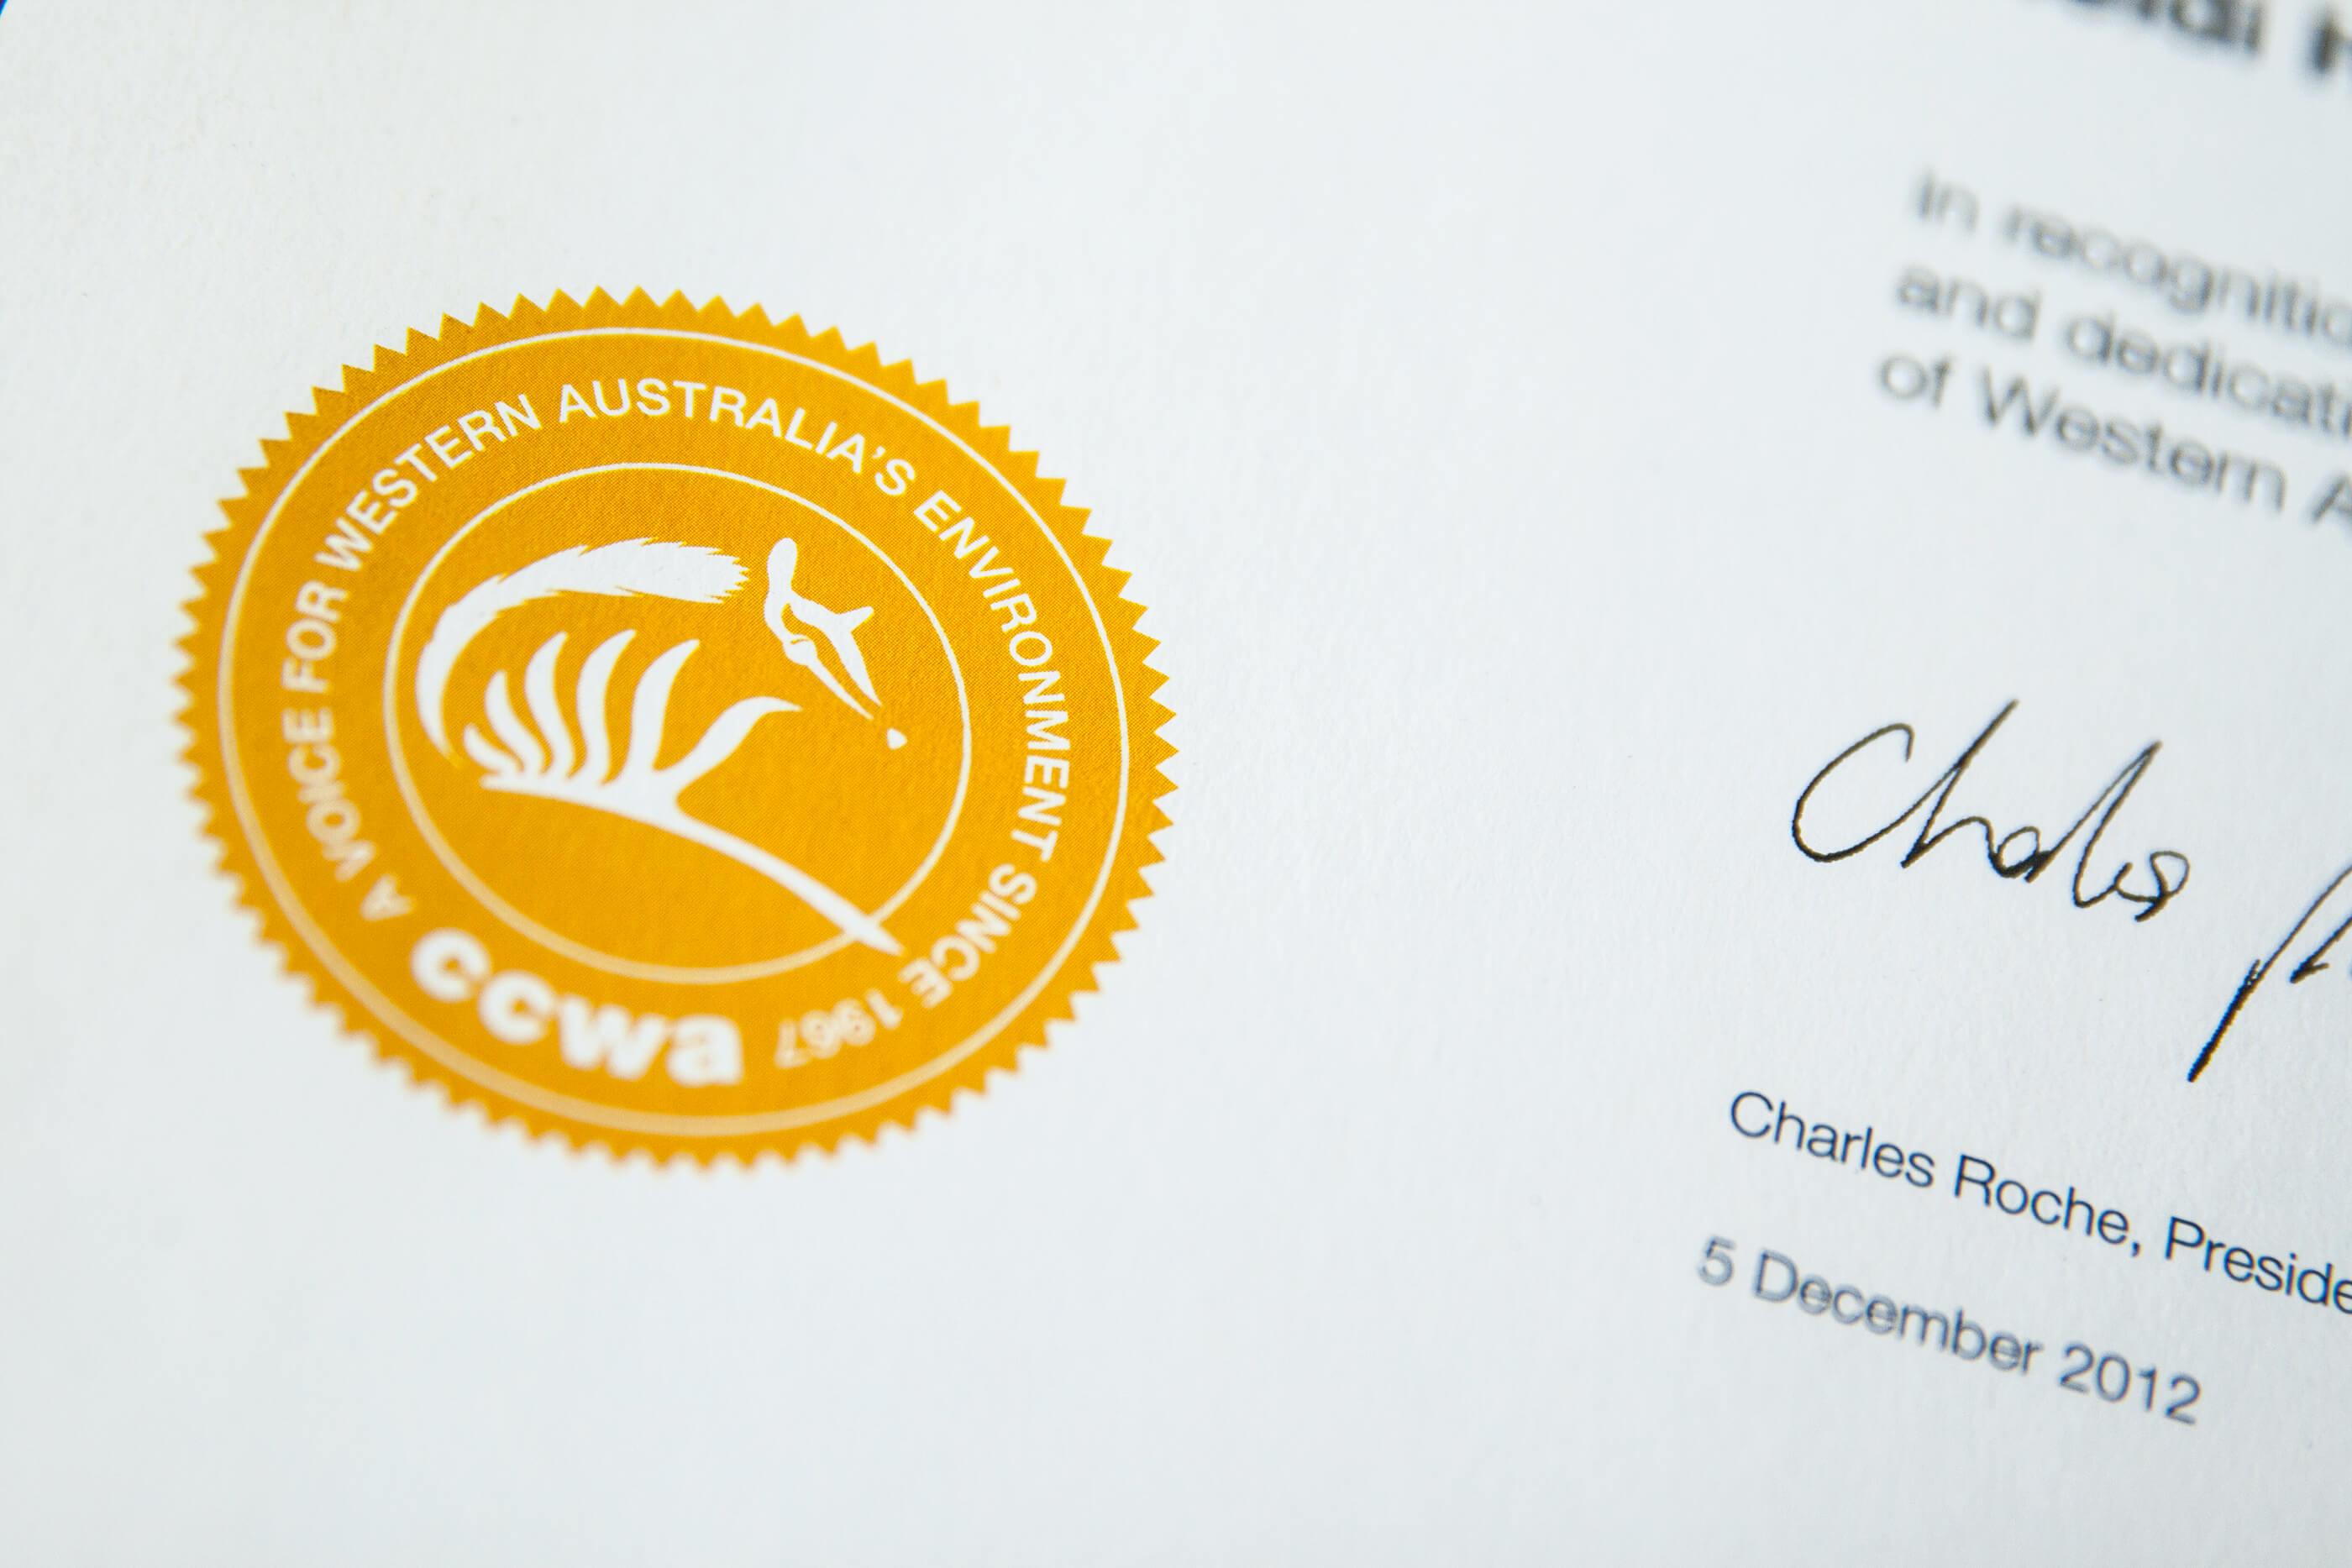 ccwa_awards_stamp